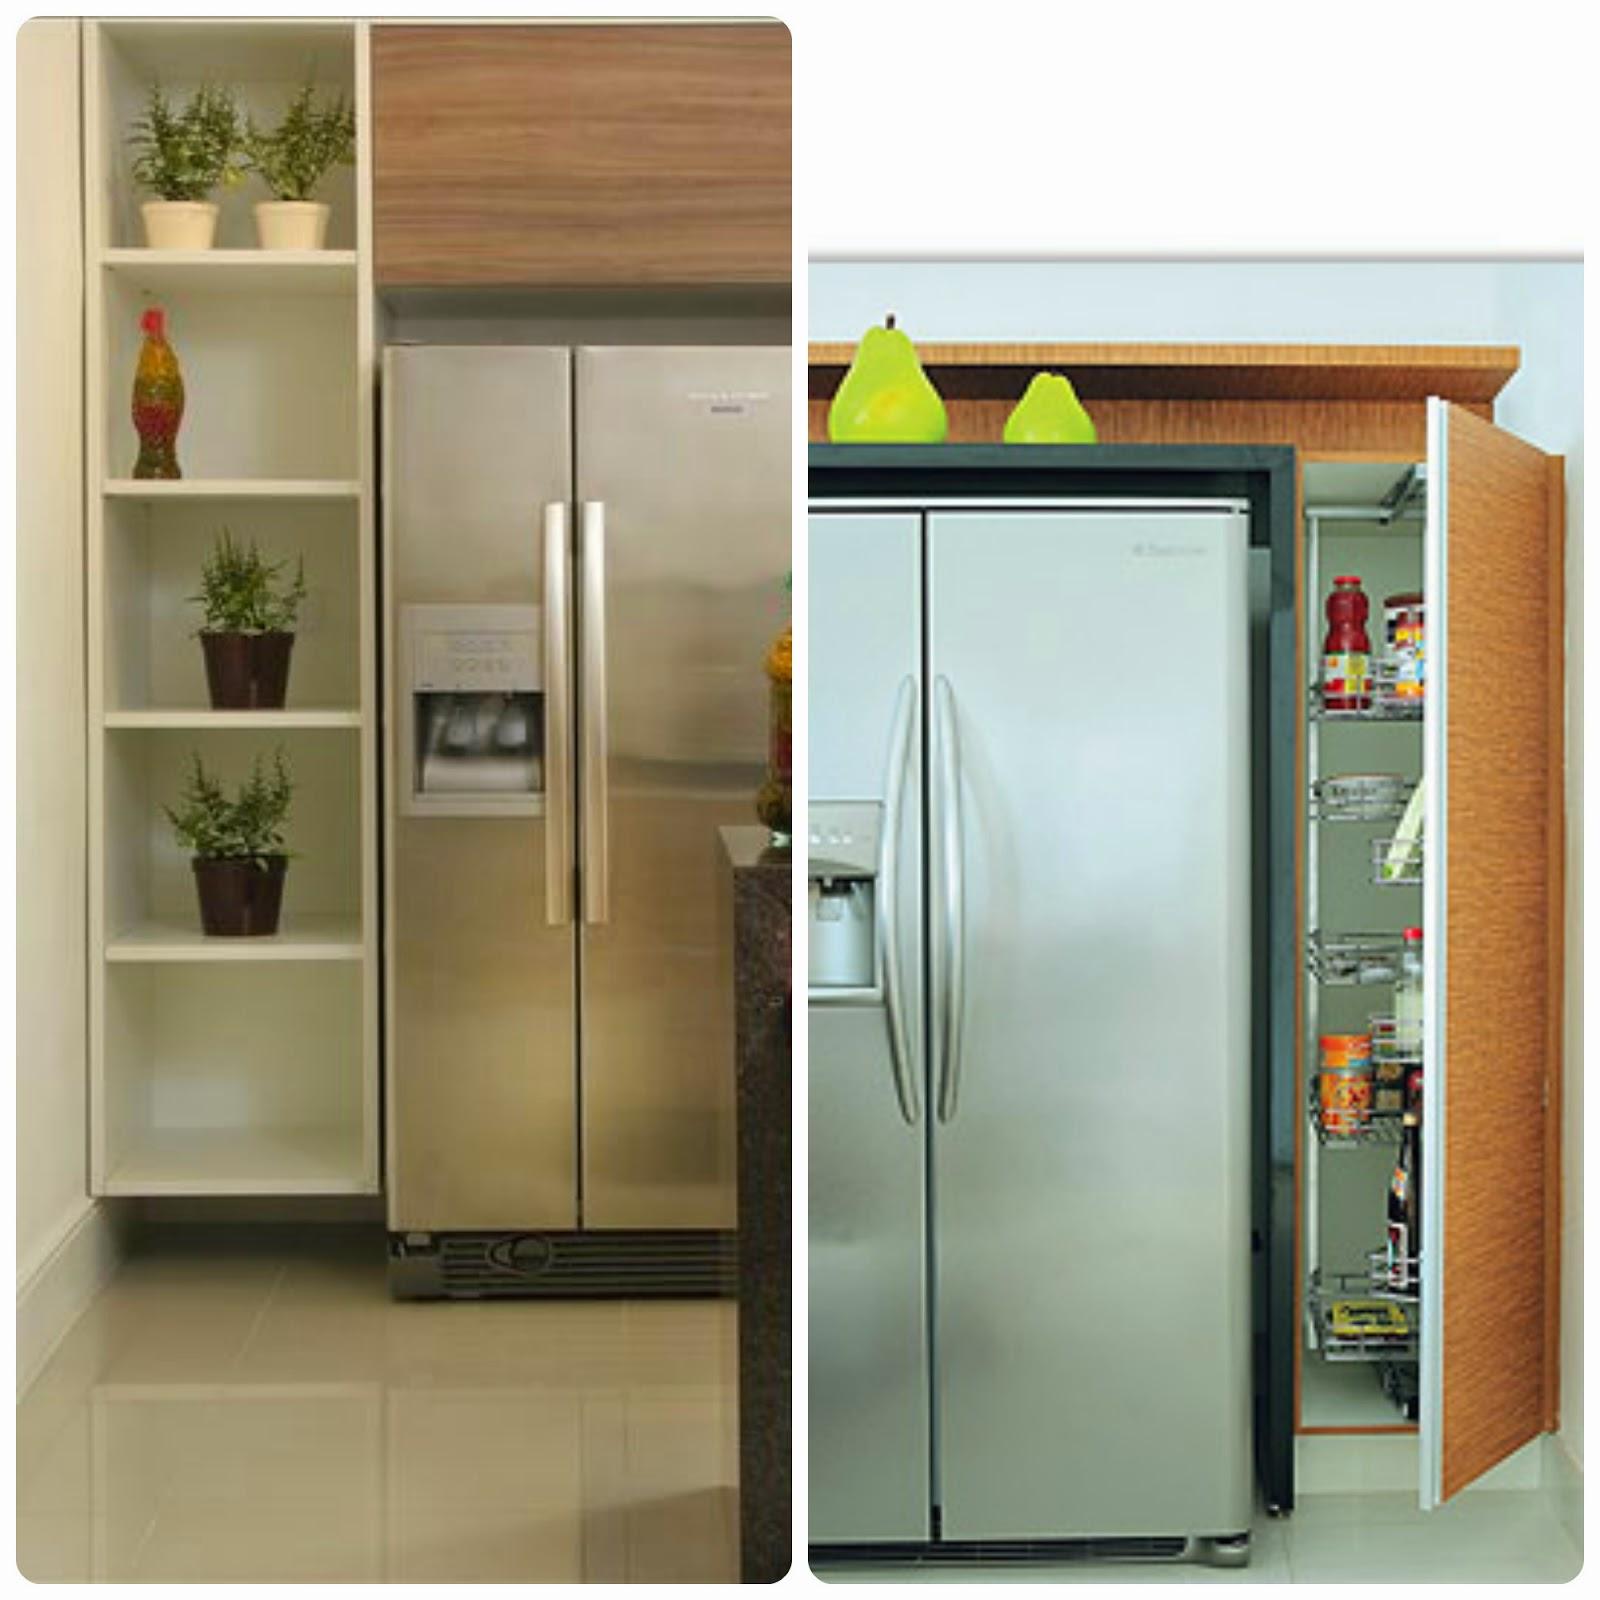 1600 1600 forward cozinhas jpg 1600 1600 cozinhas jpg see more #986633 1600 1600